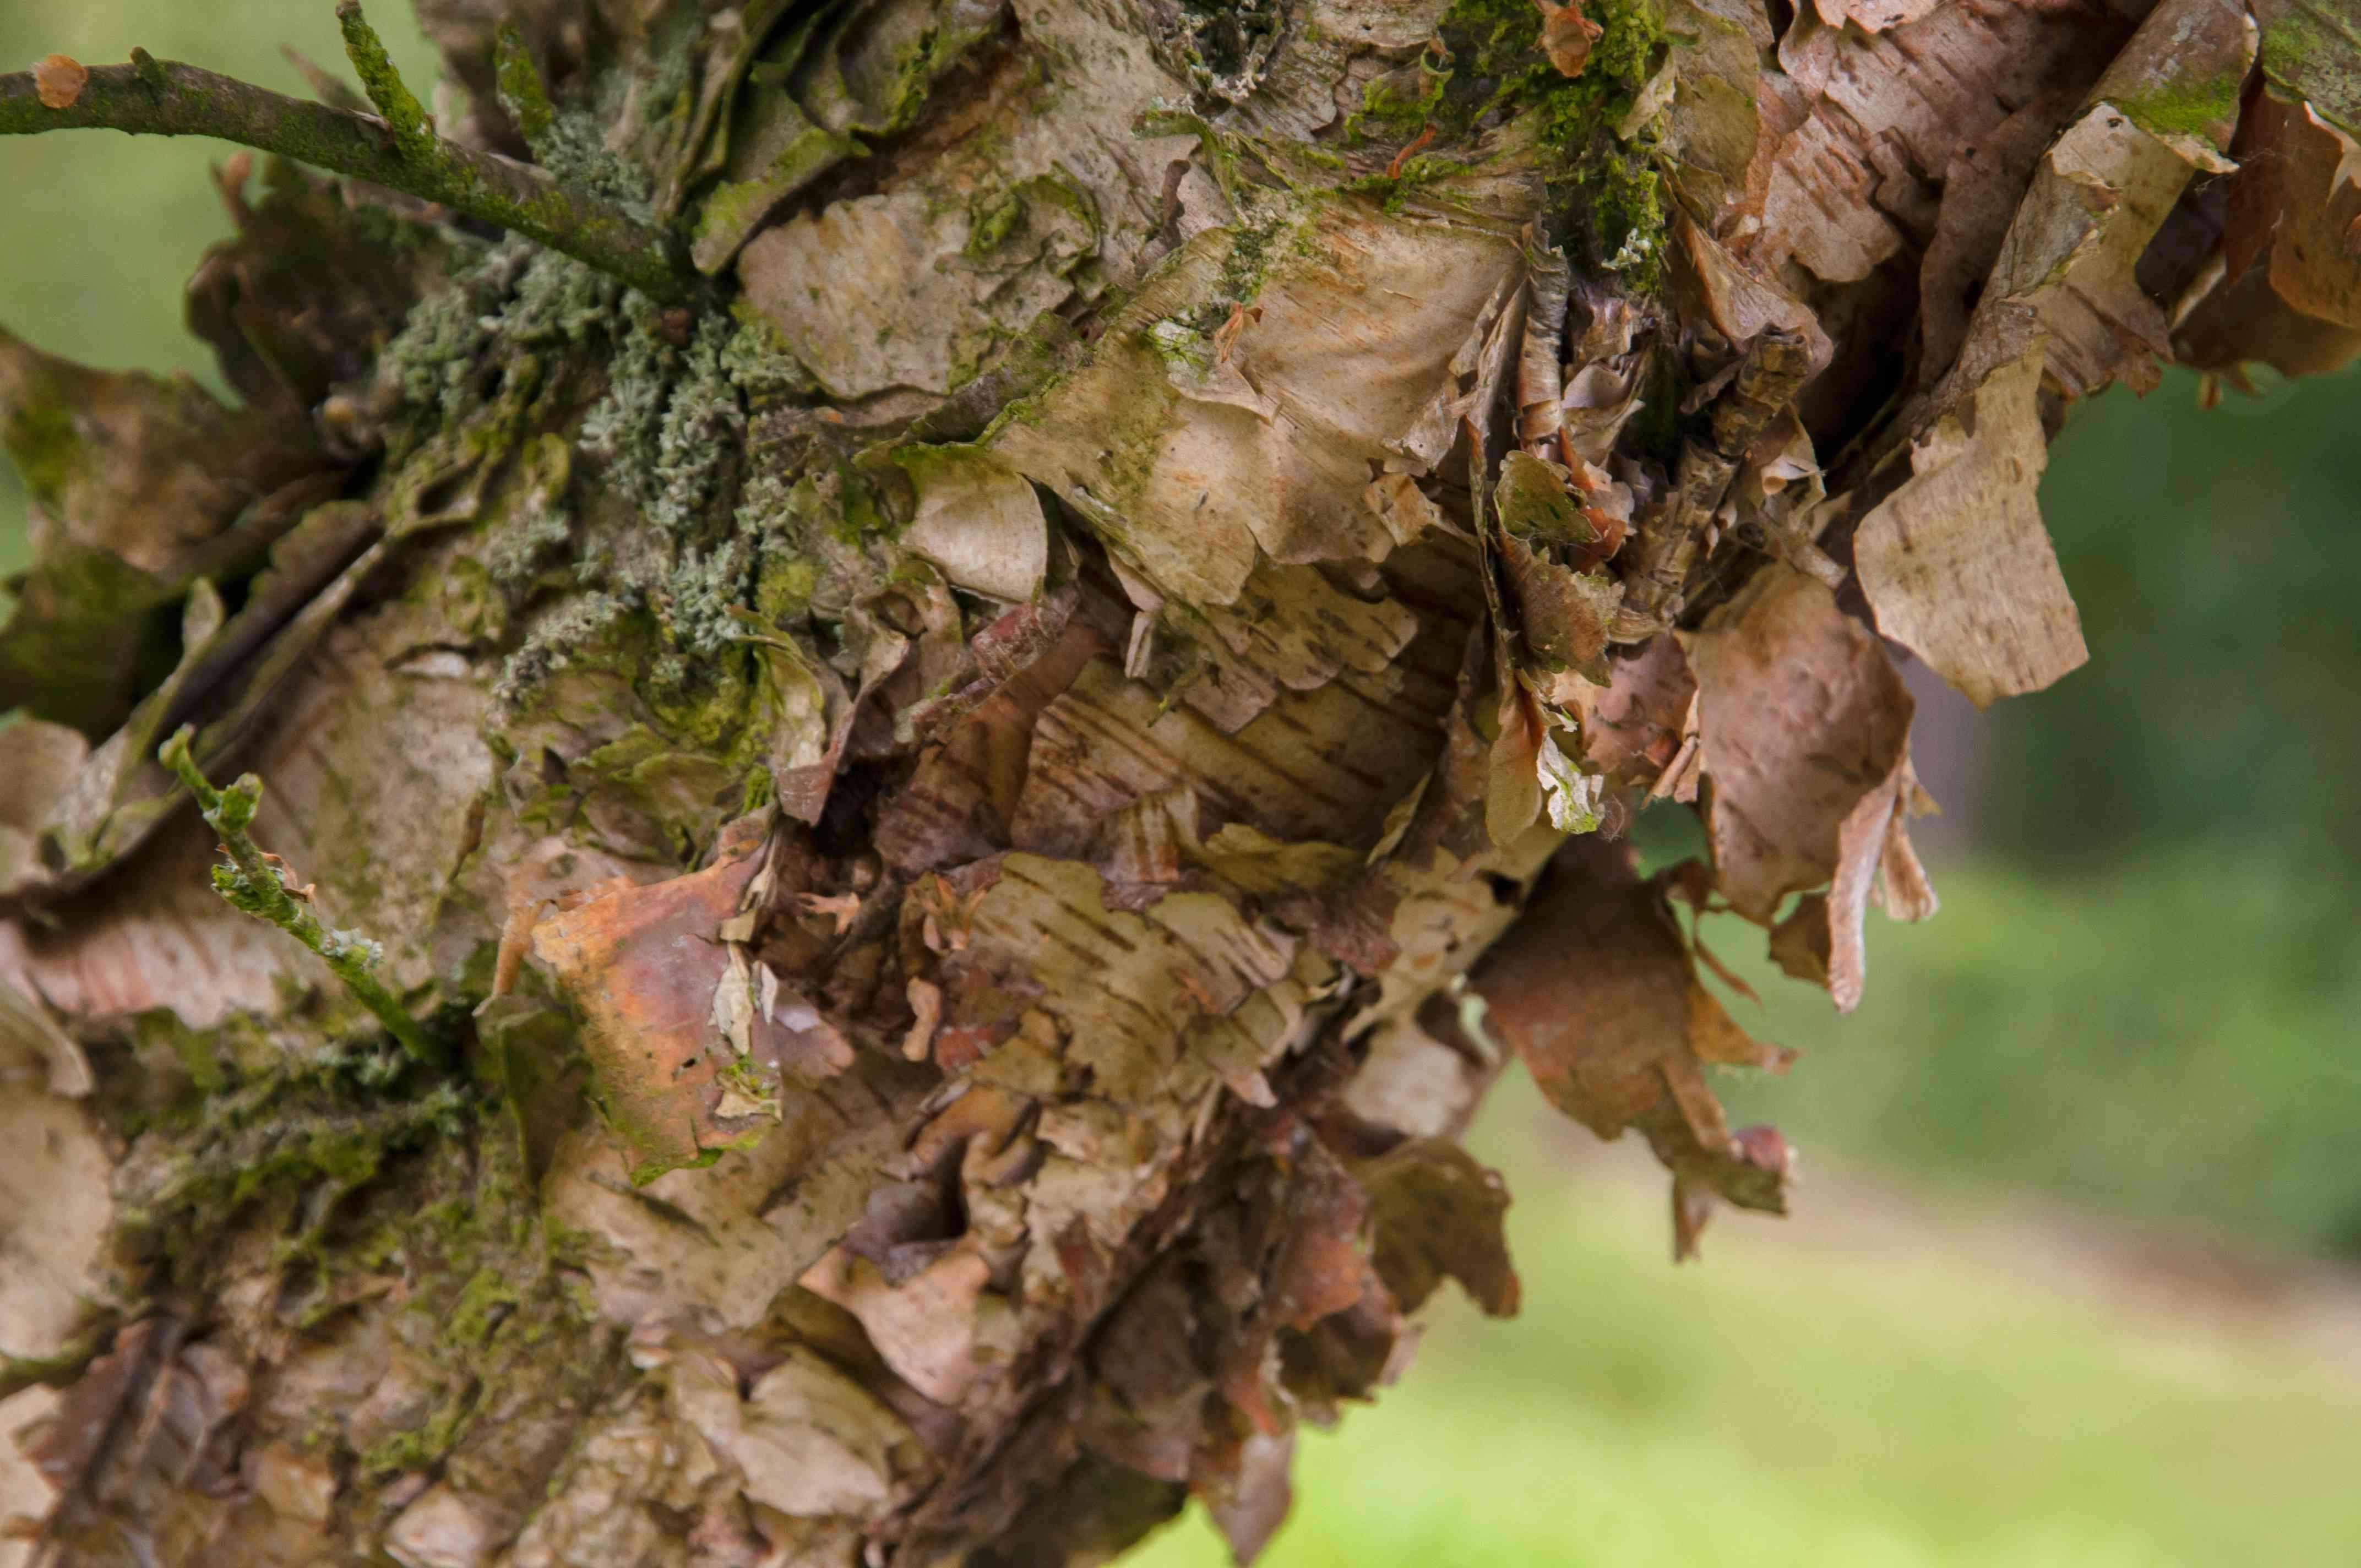 River birch tree with brown exfoliating bark closeup